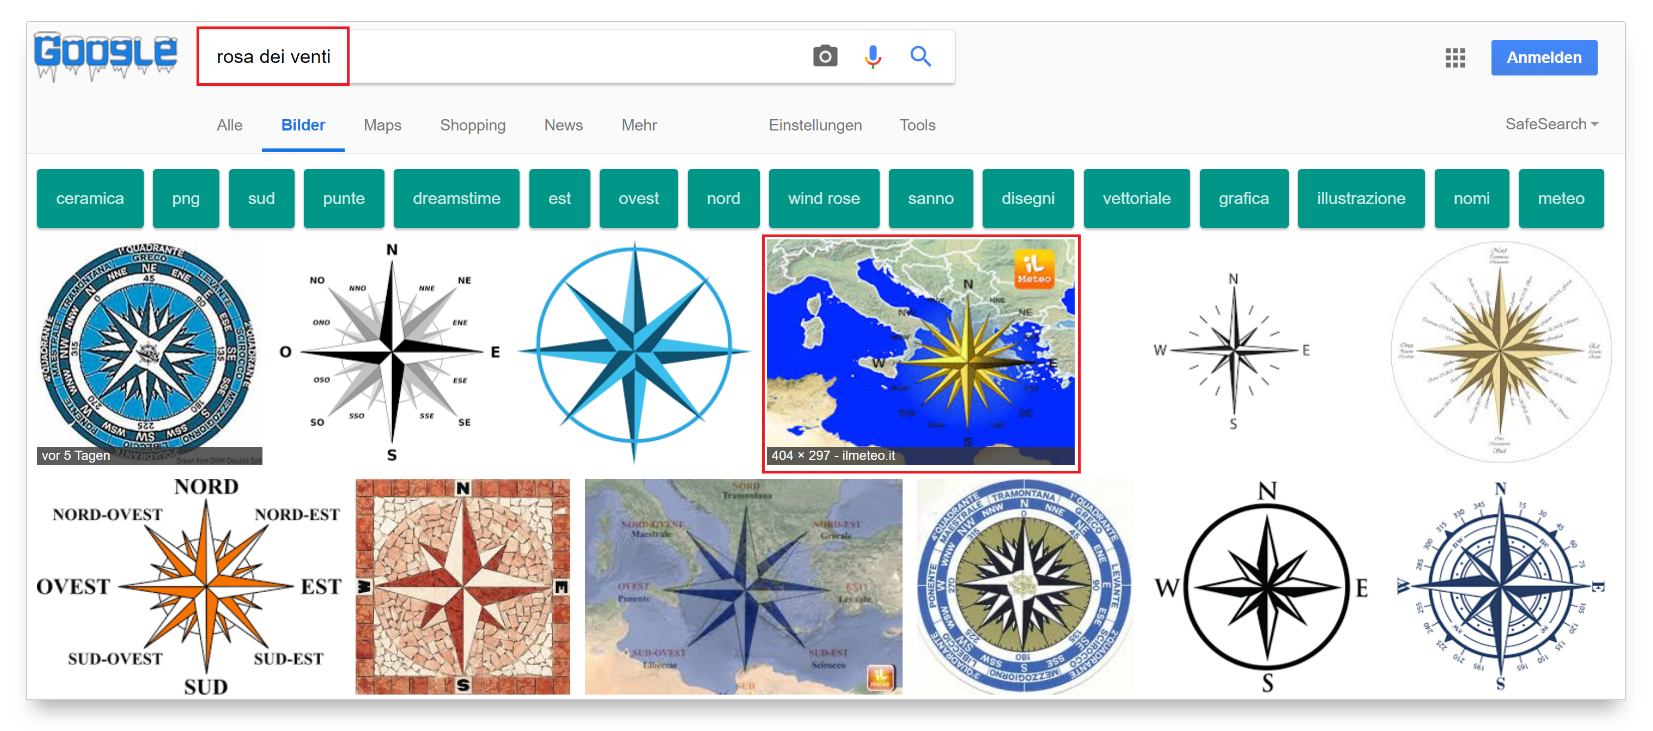 keyword ricerca immagini